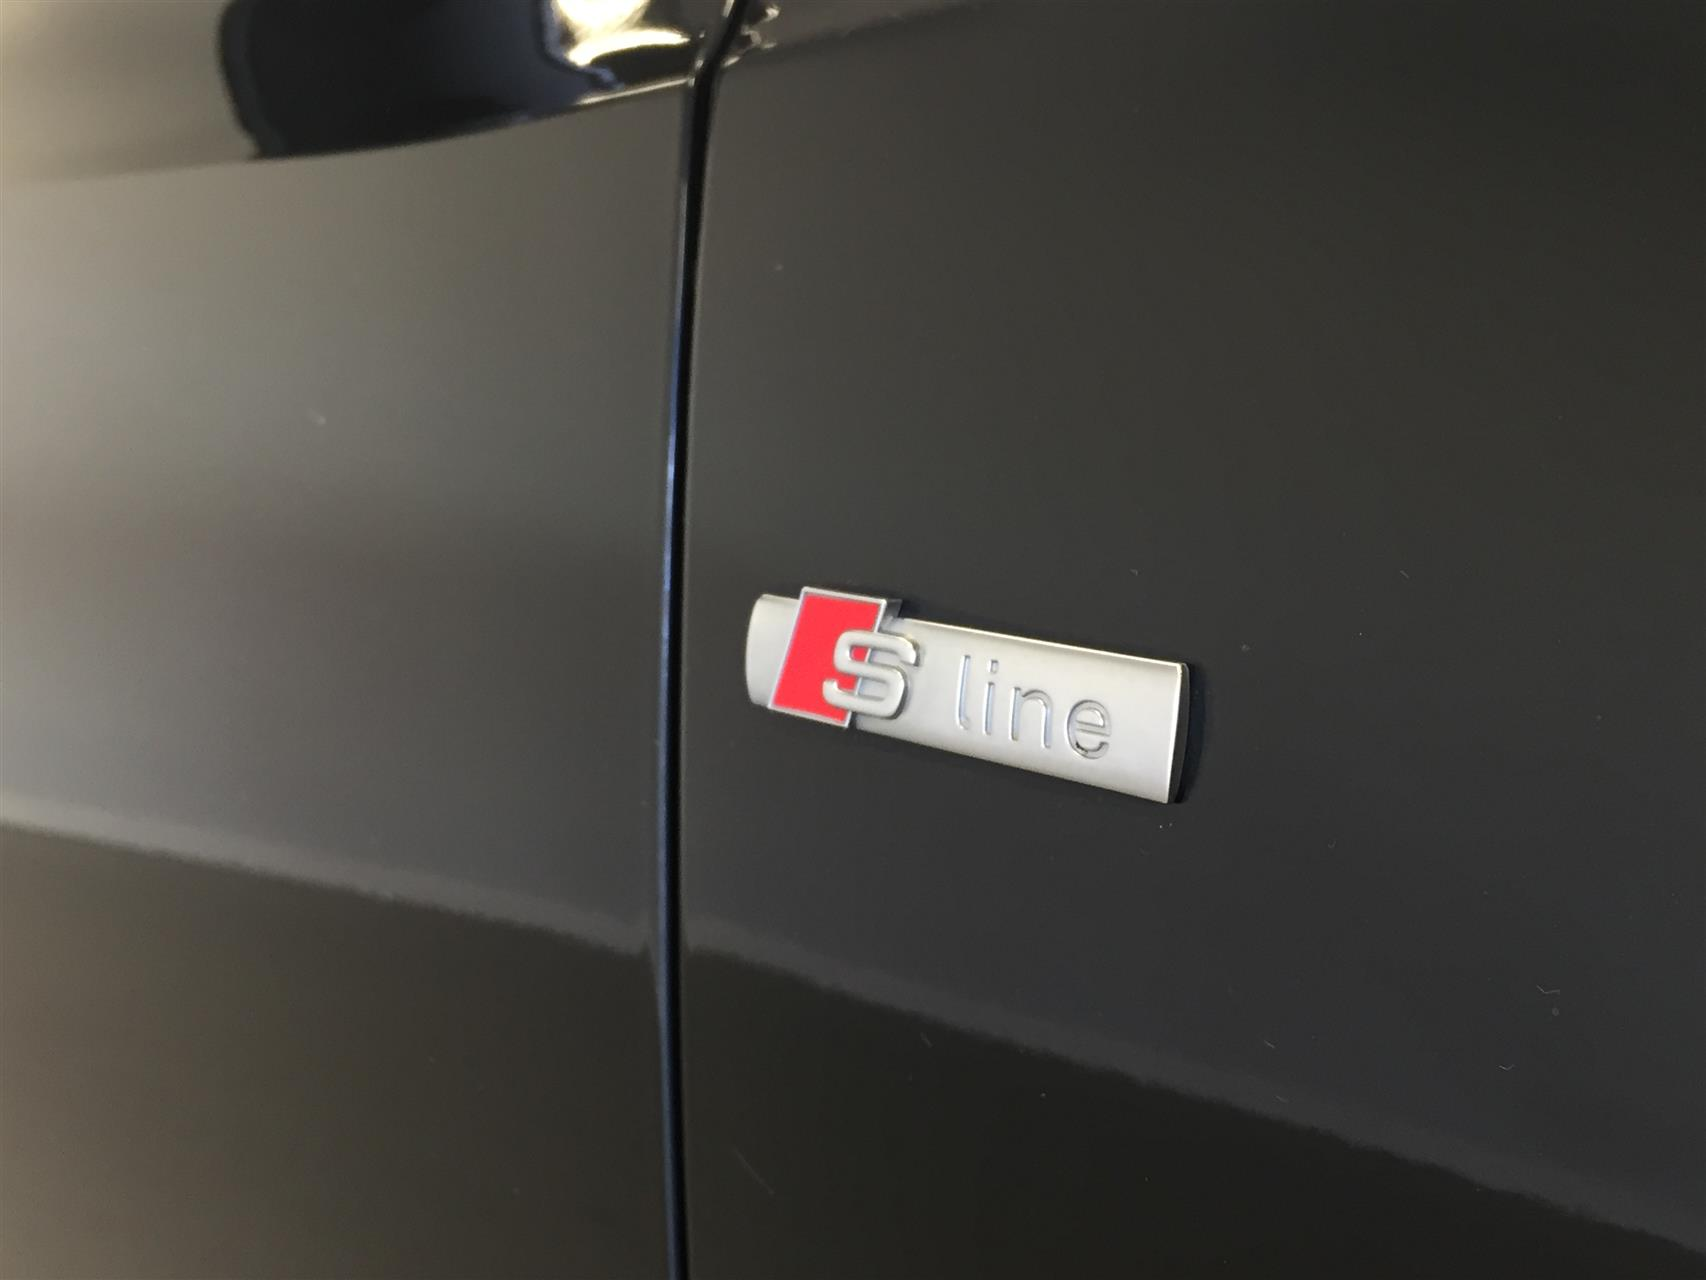 Billede af Audi A5 Sportback 1,8 TFSI Multitr. 144HK 5d 8g Trinl. Gear